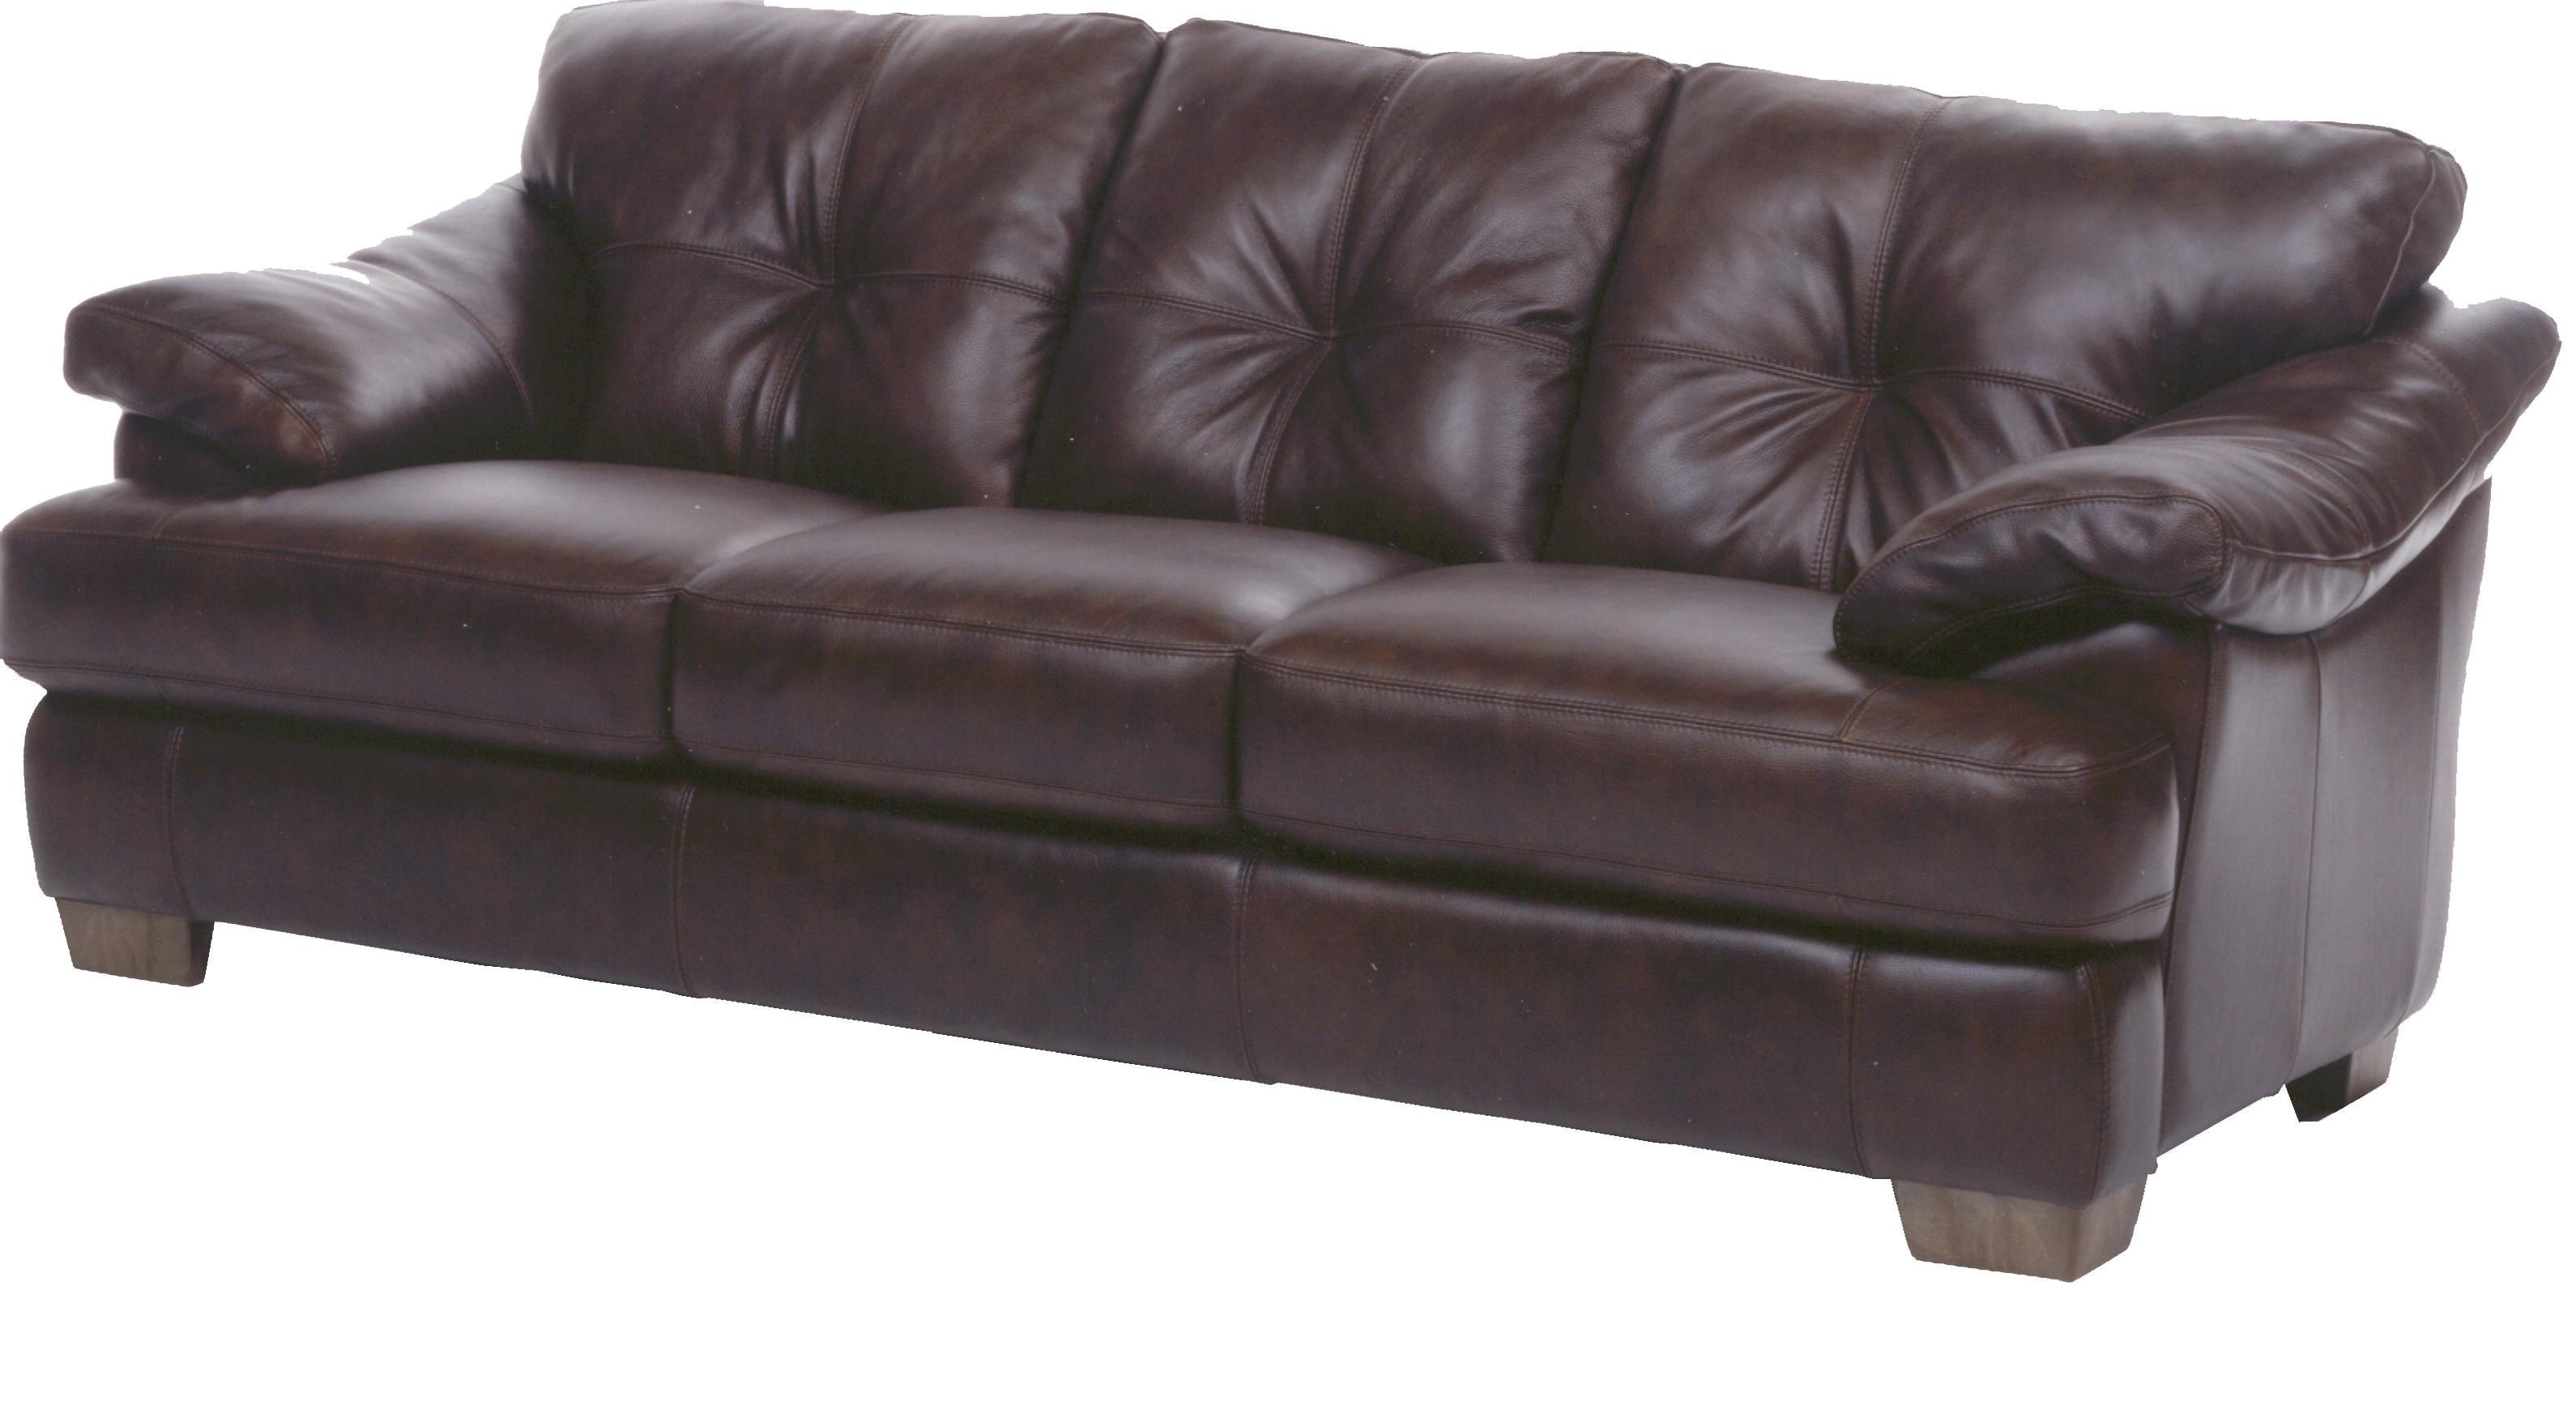 C483 Sofa By Chateau D Ax Sofa Mattress Furniture Leather Sofa